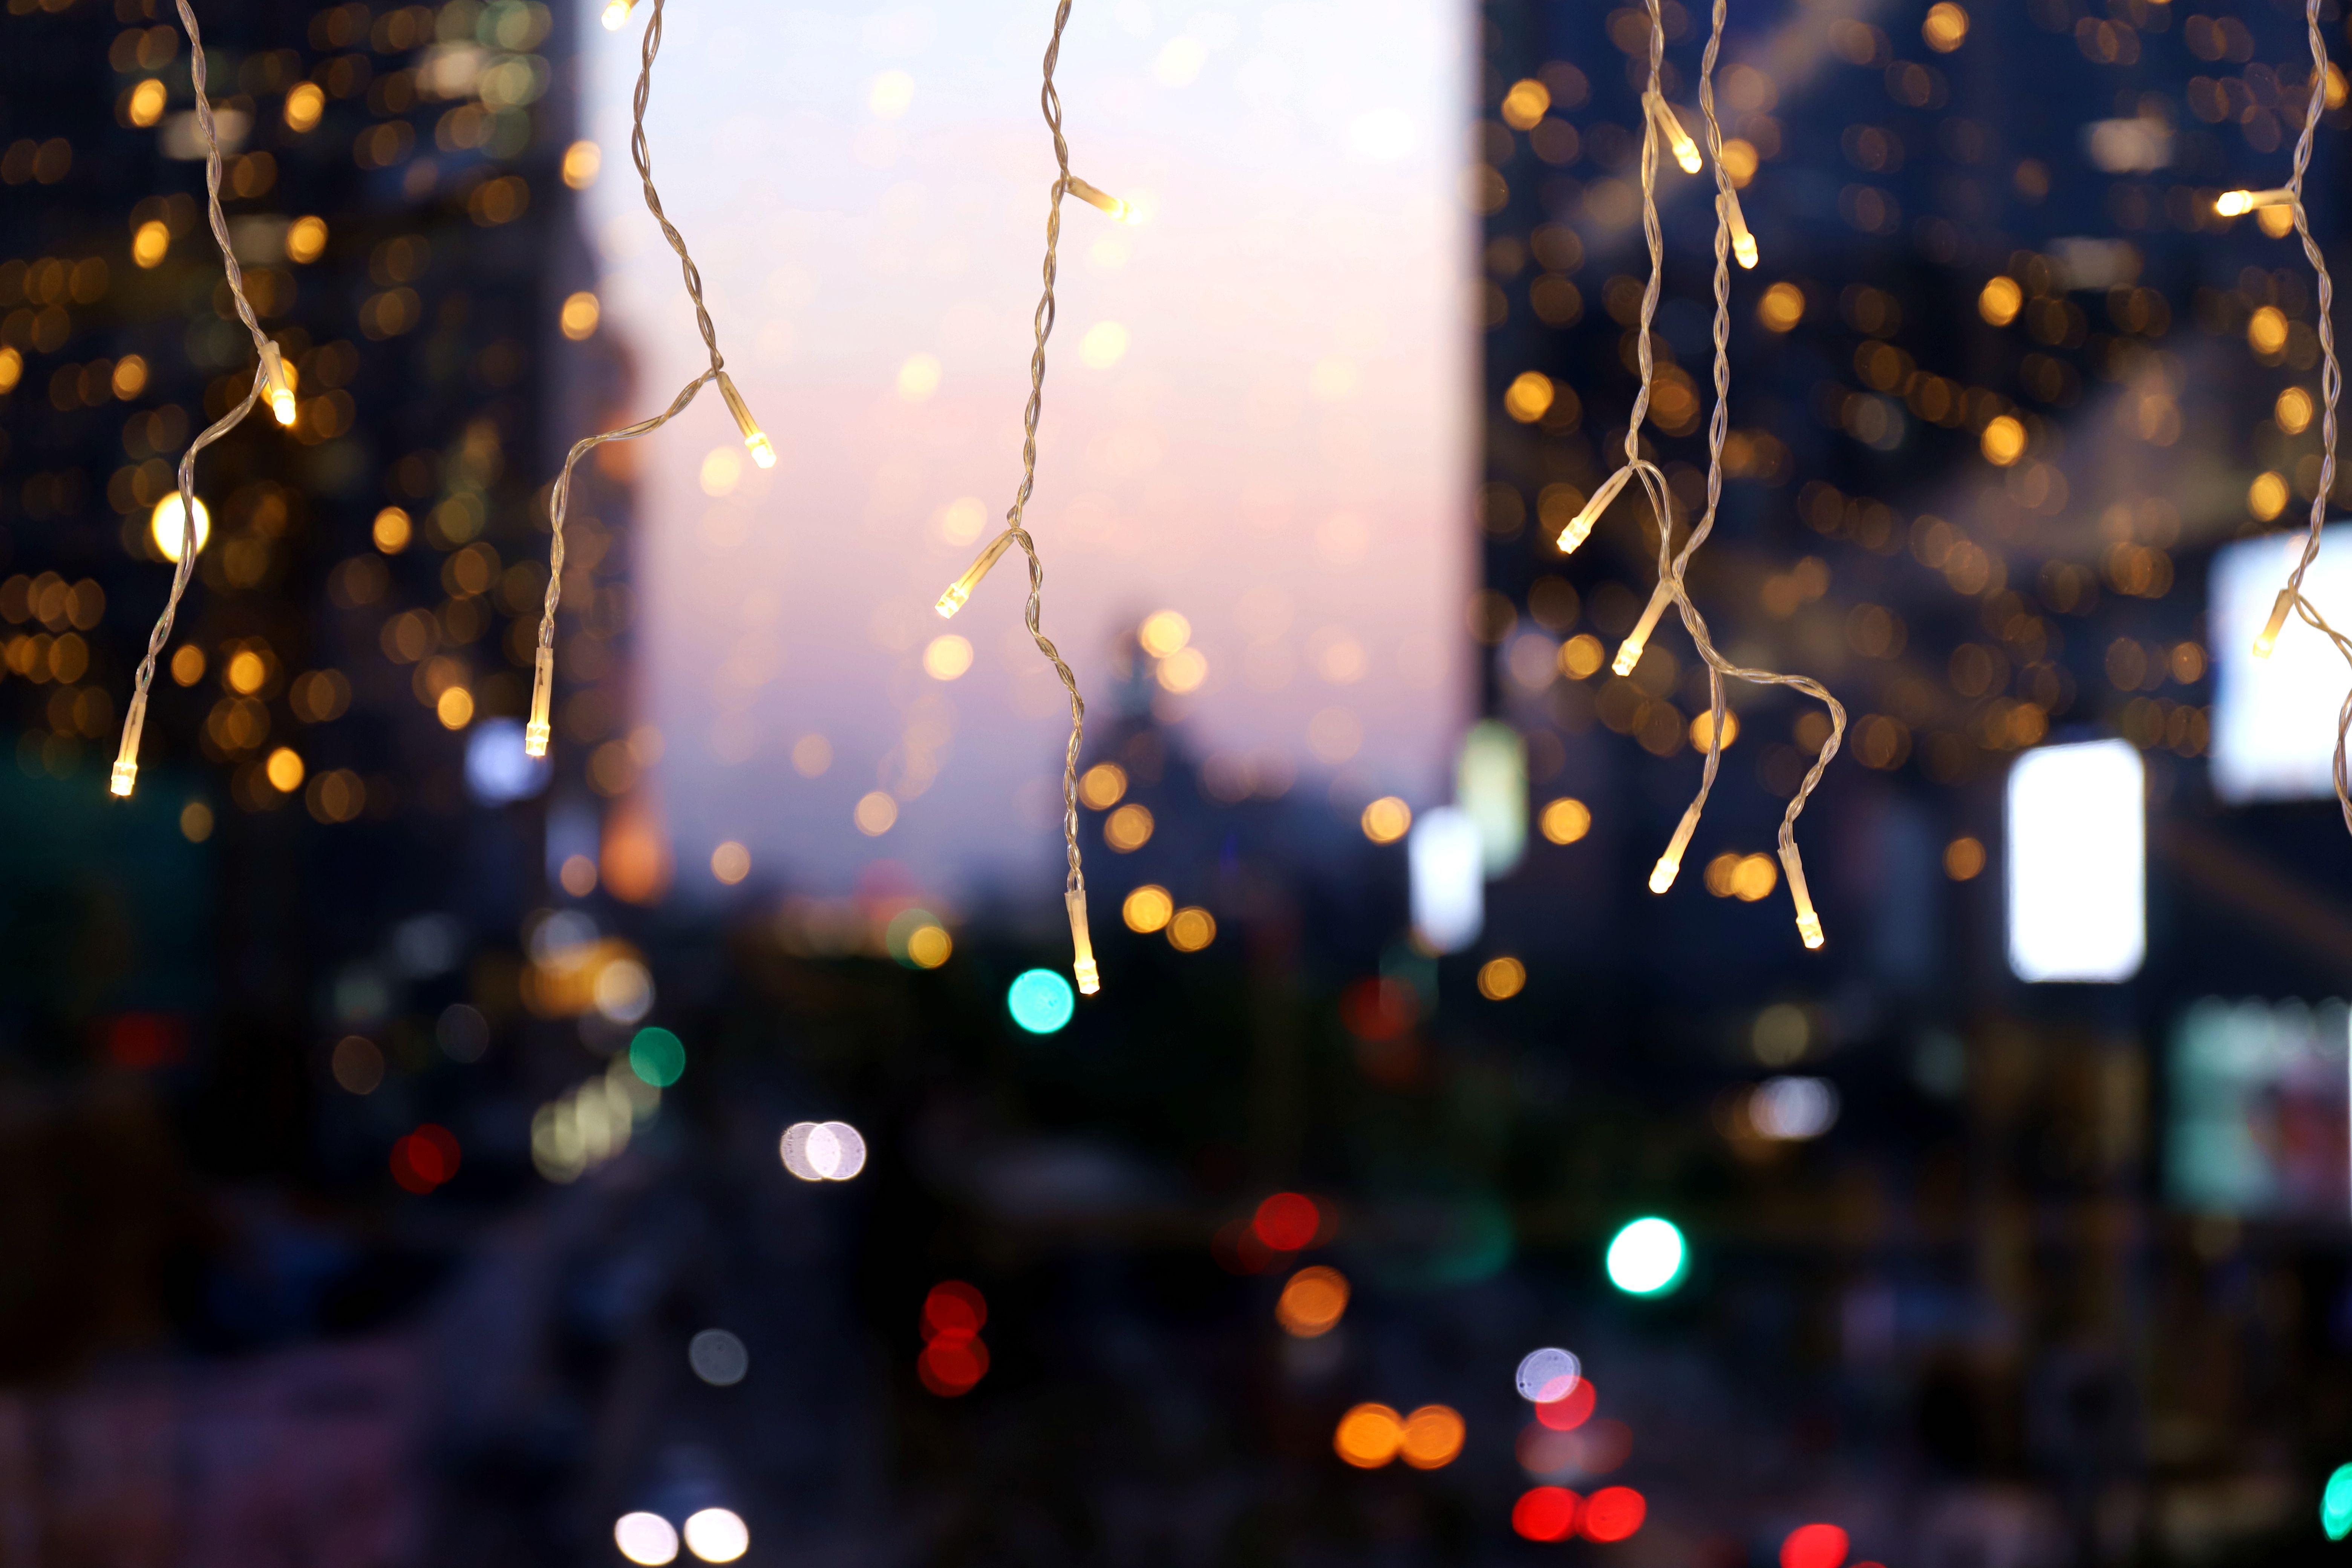 Fairy Lights Fairly Bokeh And Lighting Hd Photo By Nvdu Nvdu On